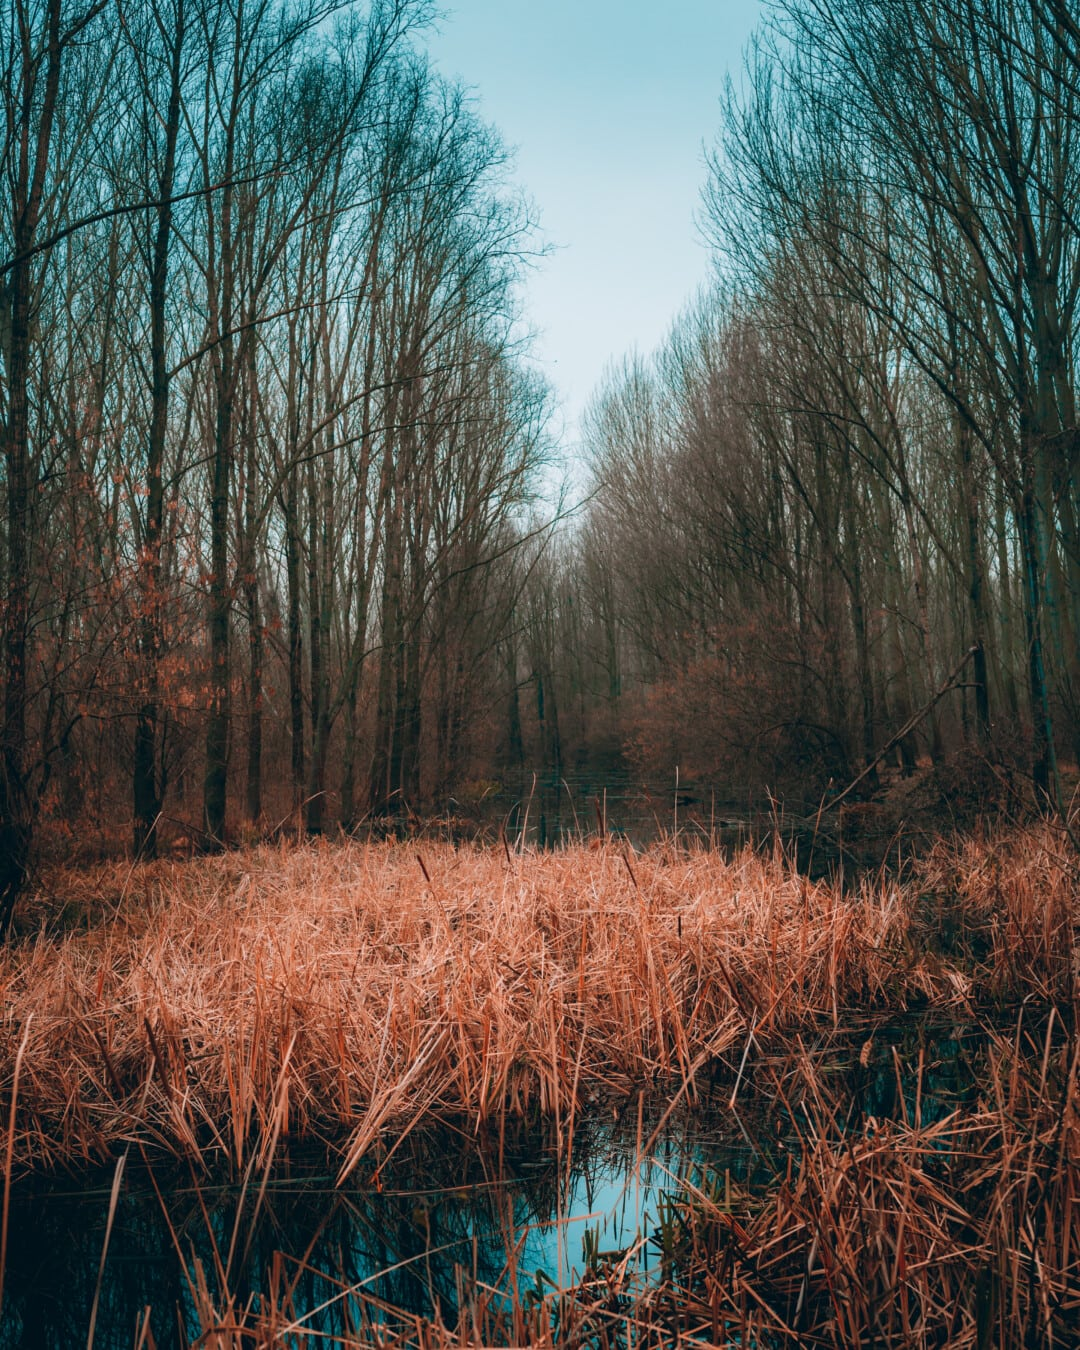 лес, сорняки, осень, болото, река, дерево, пейзаж, рассвет, дерево, природа